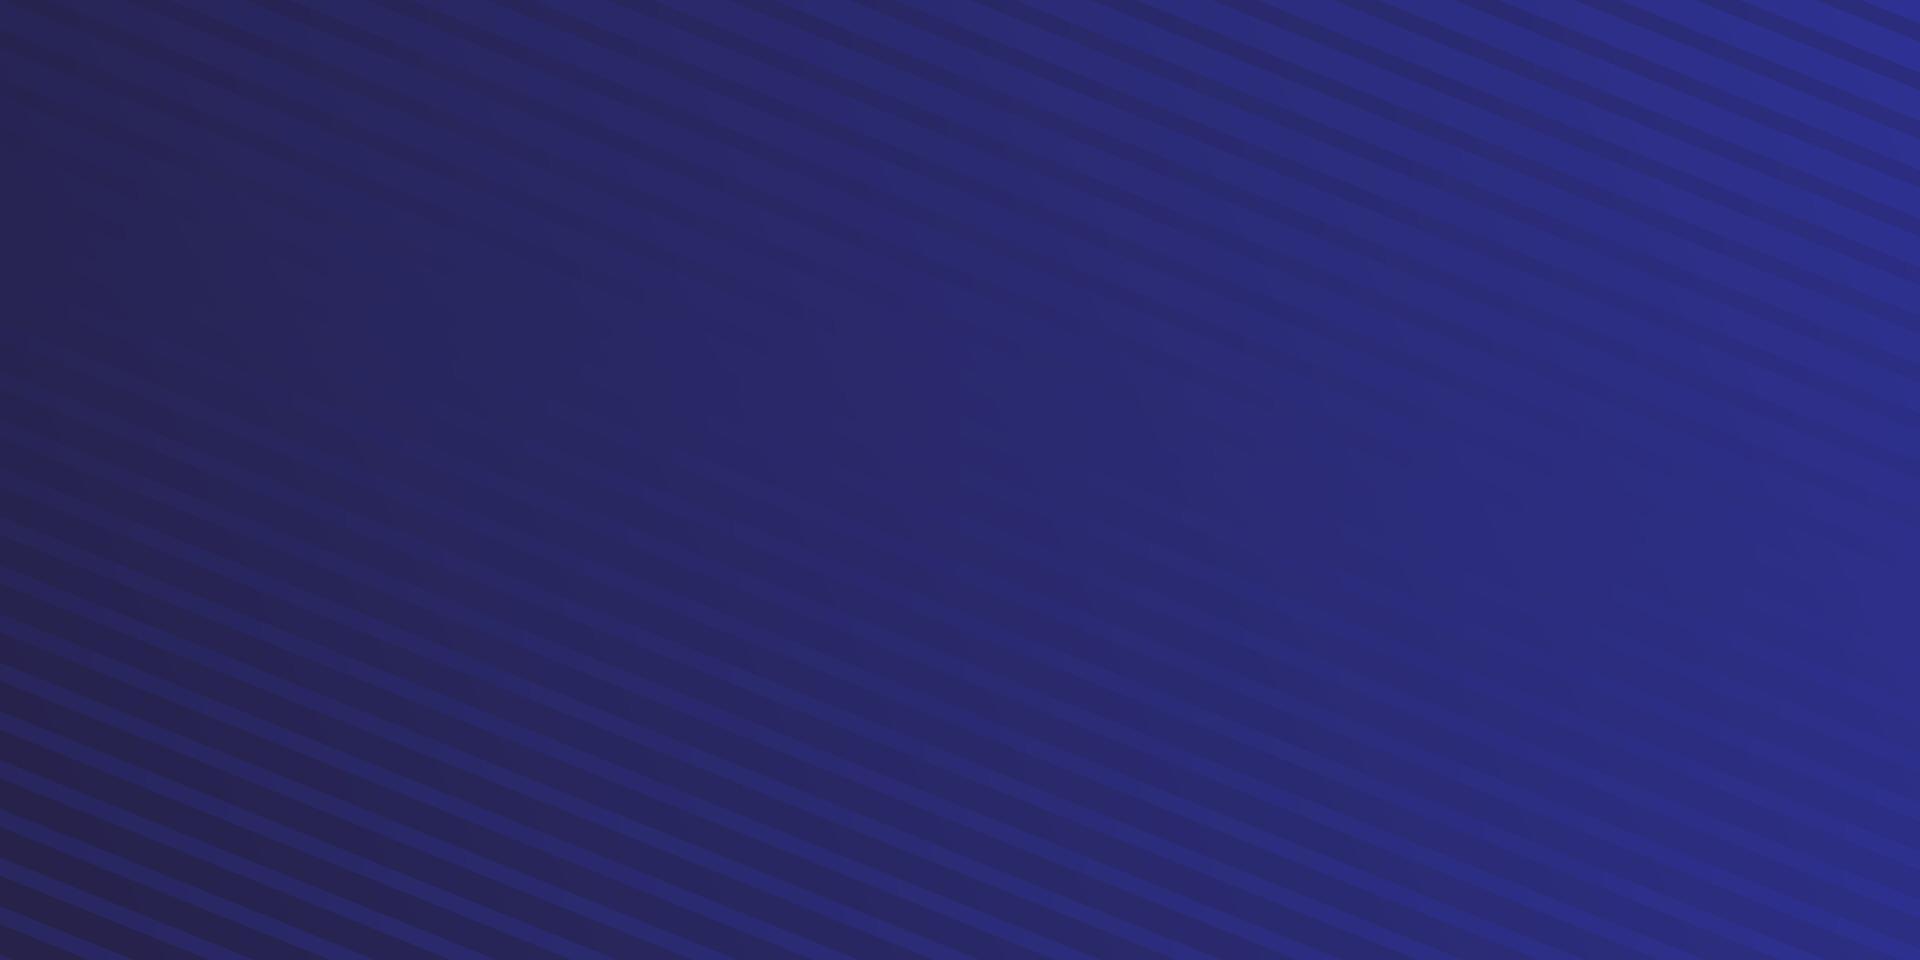 abstract donkerblauw streeppatroon vector